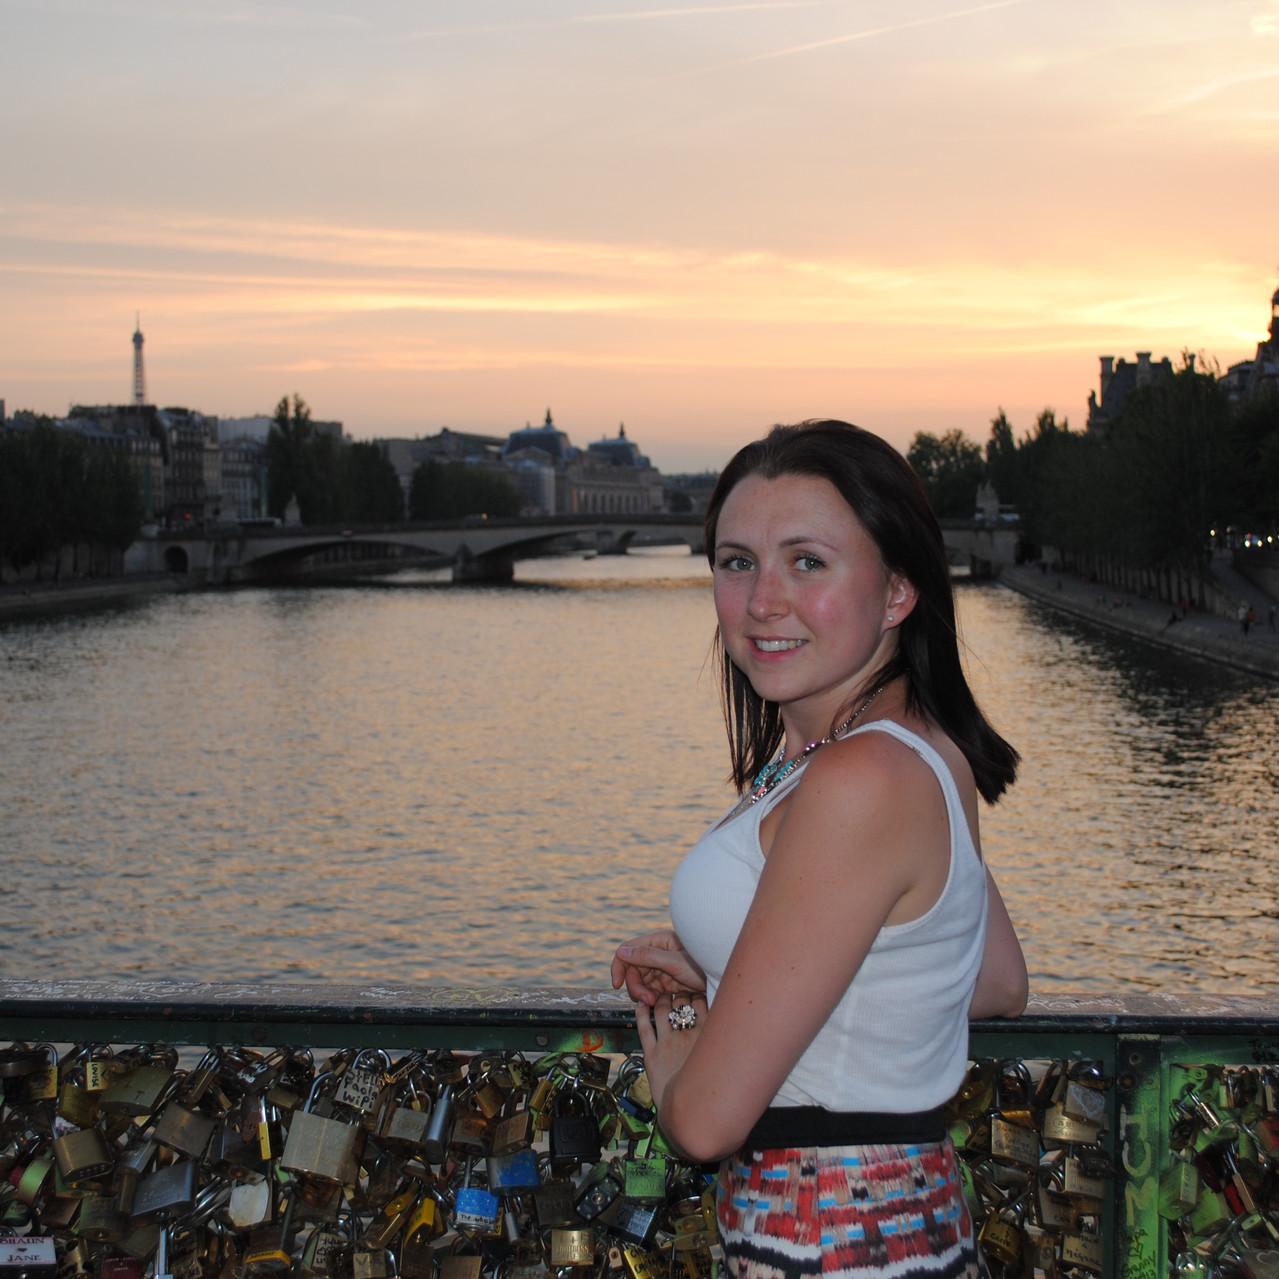 Seine and Love Lock Bridge